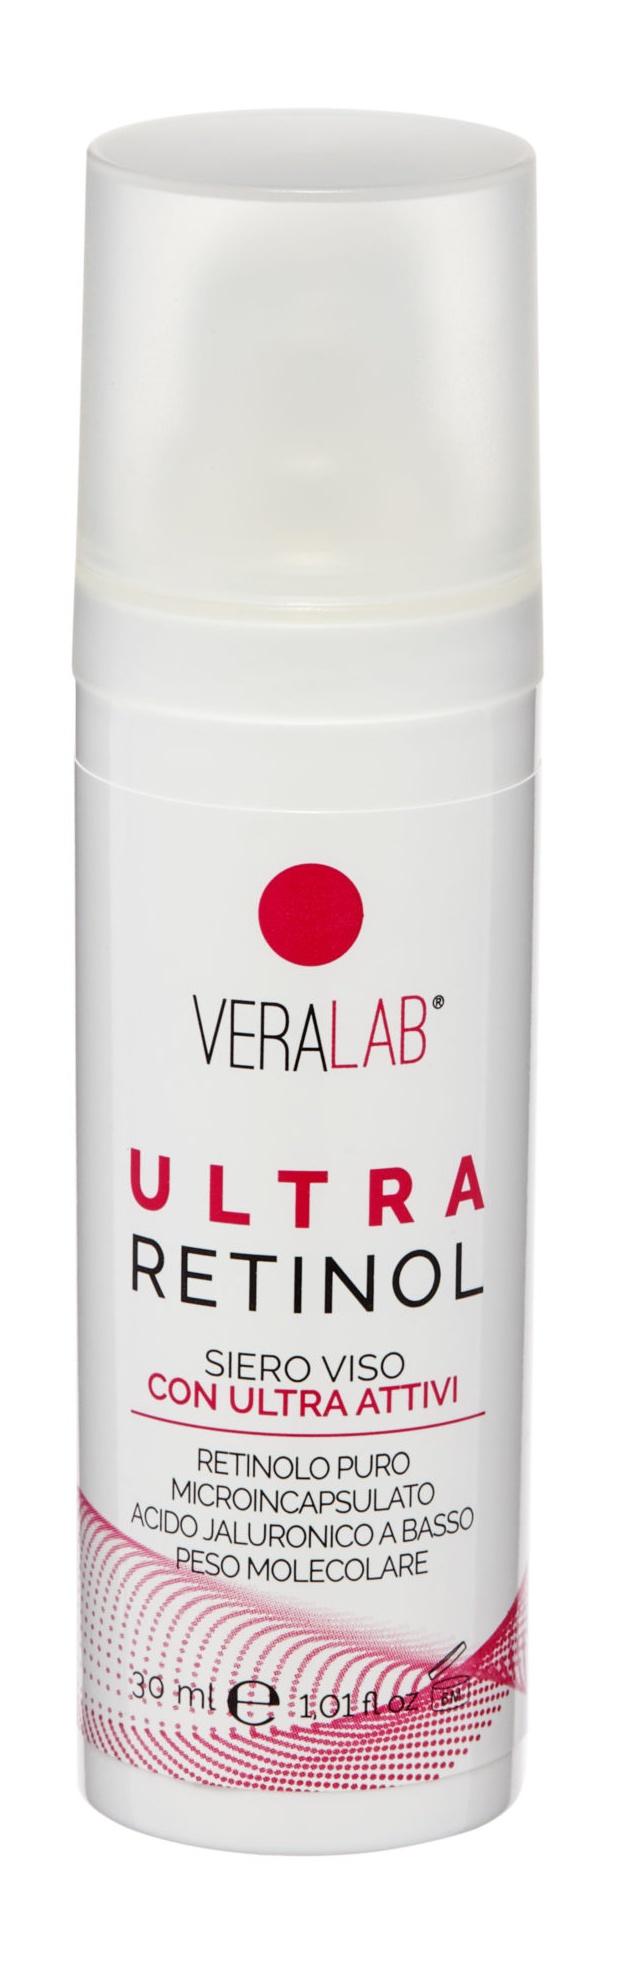 VeraLab Ultra Retinol